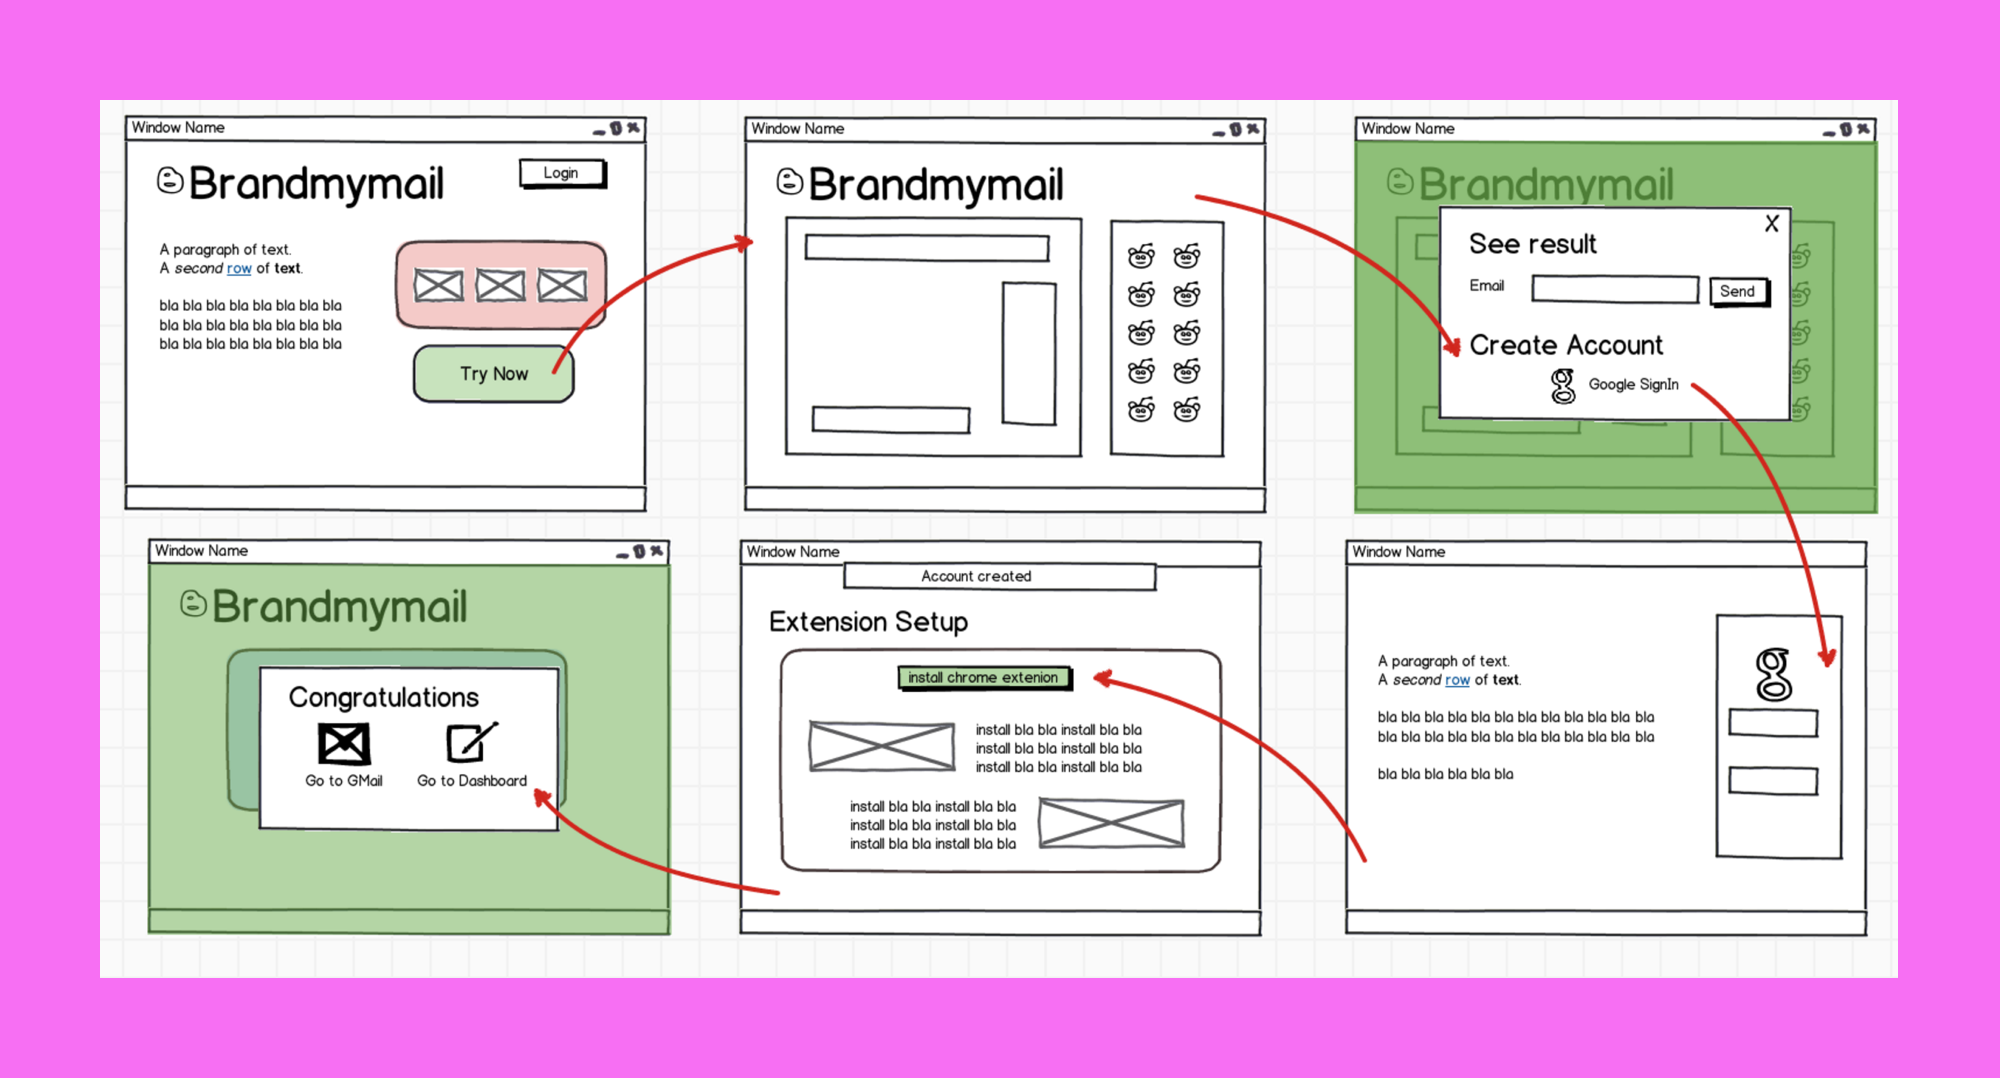 bmm-flow-redesign.png